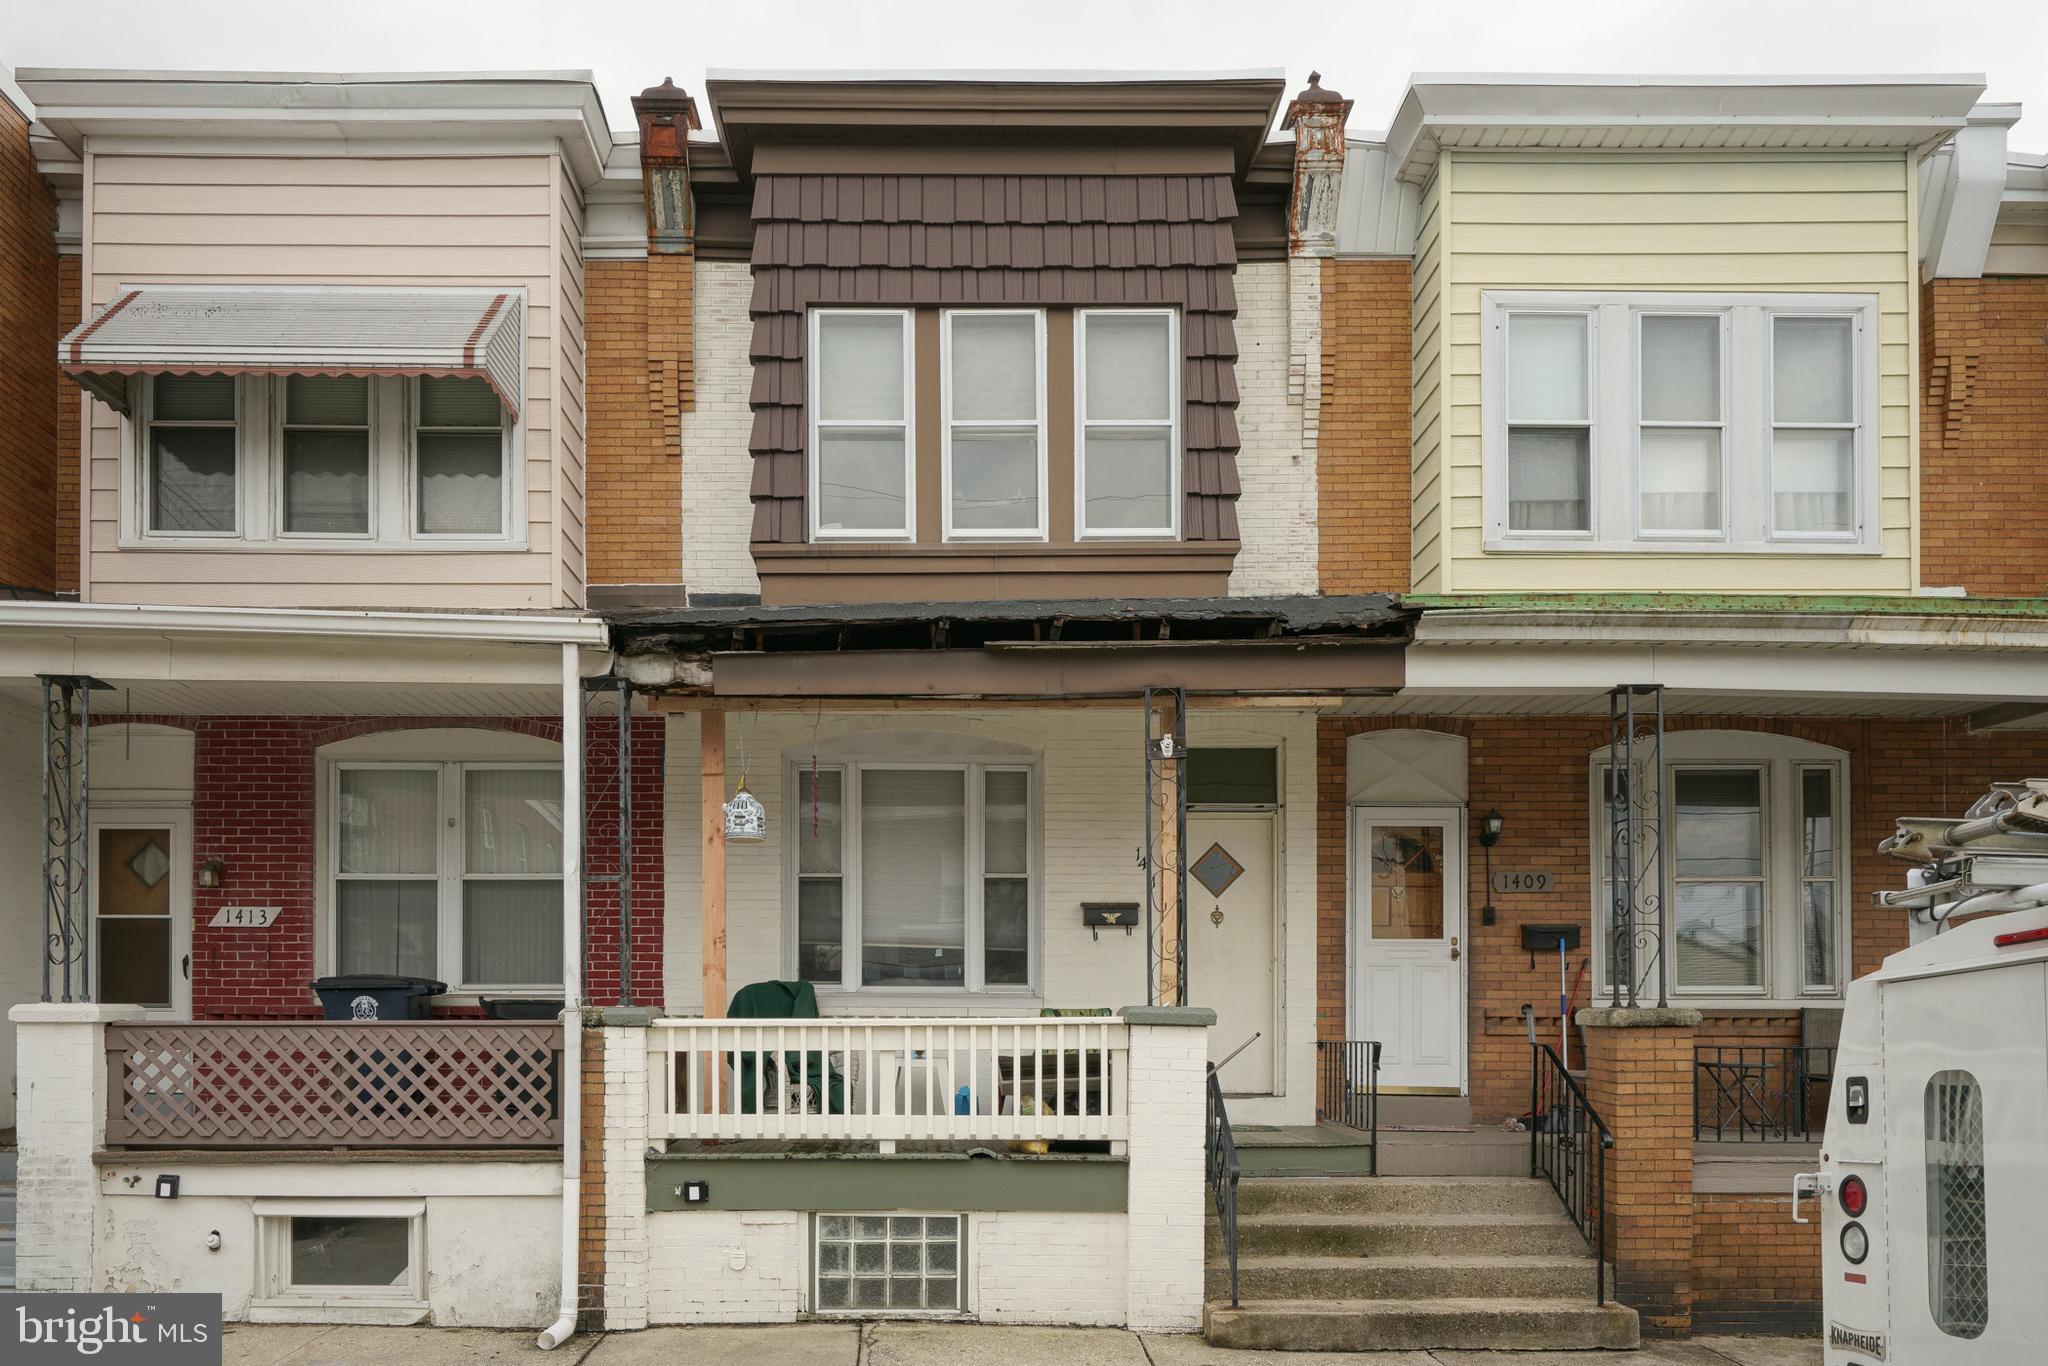 1411 E 11TH STREET, EDDYSTONE, PA 19022